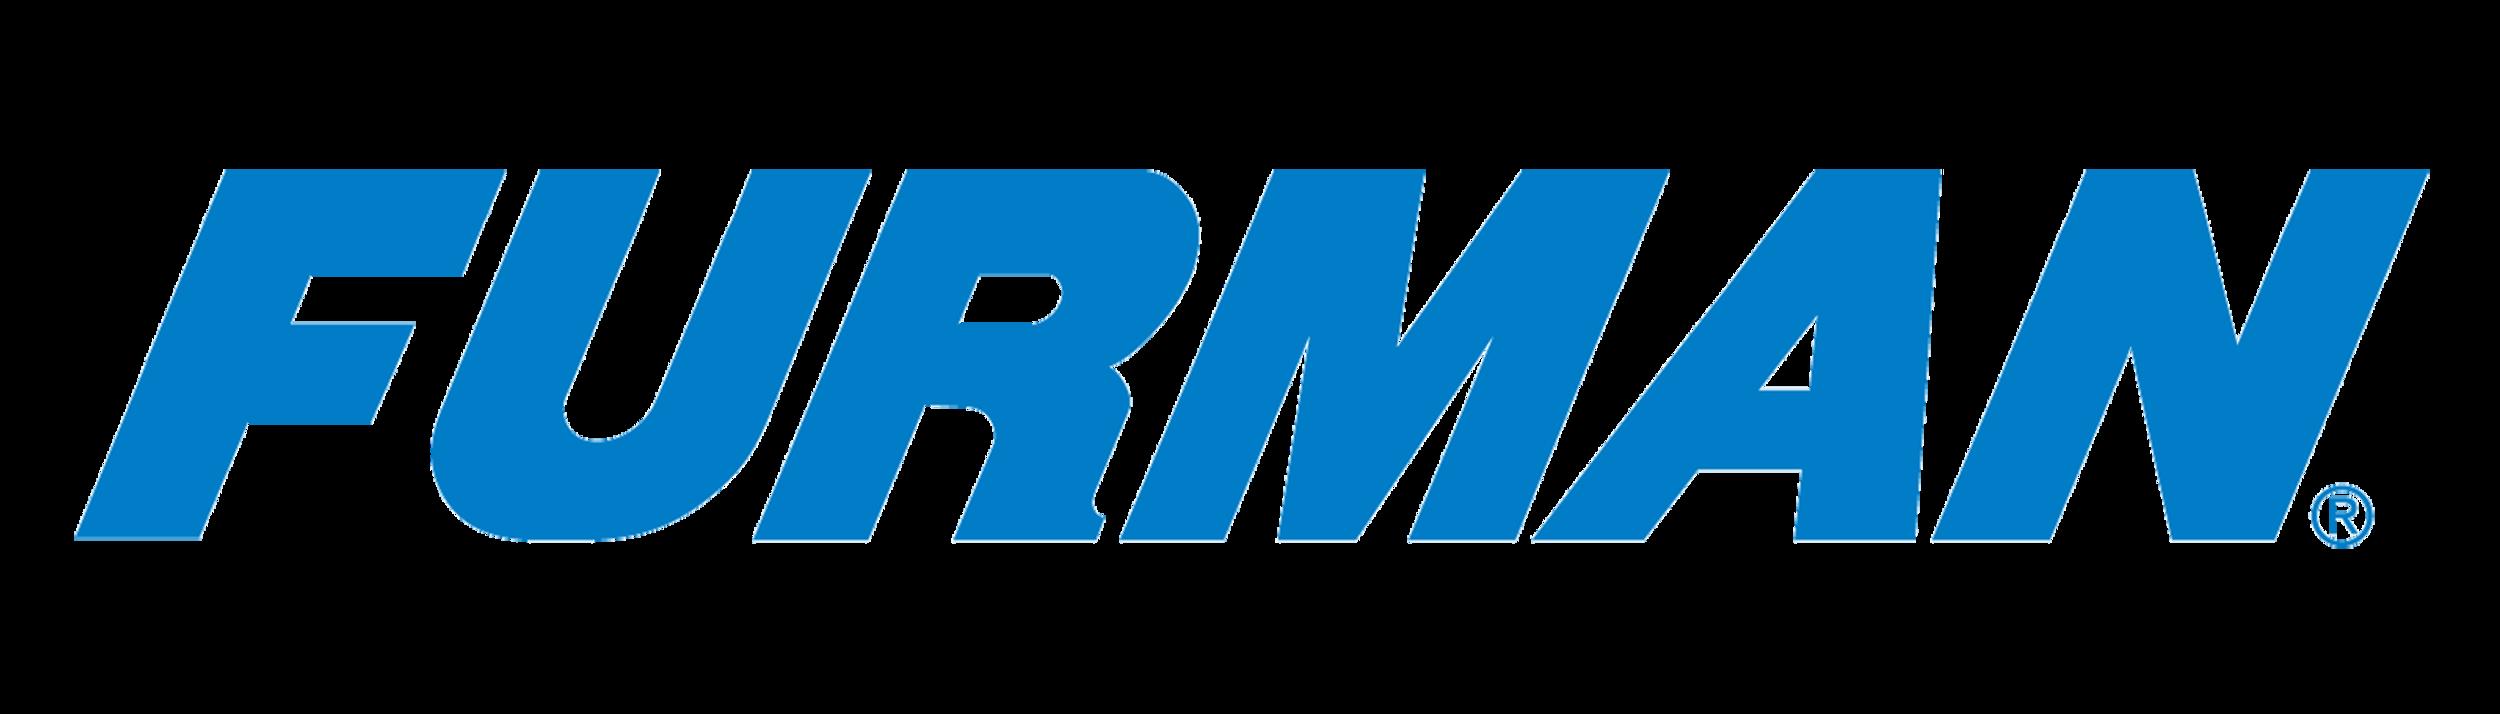 Furman-logo.png